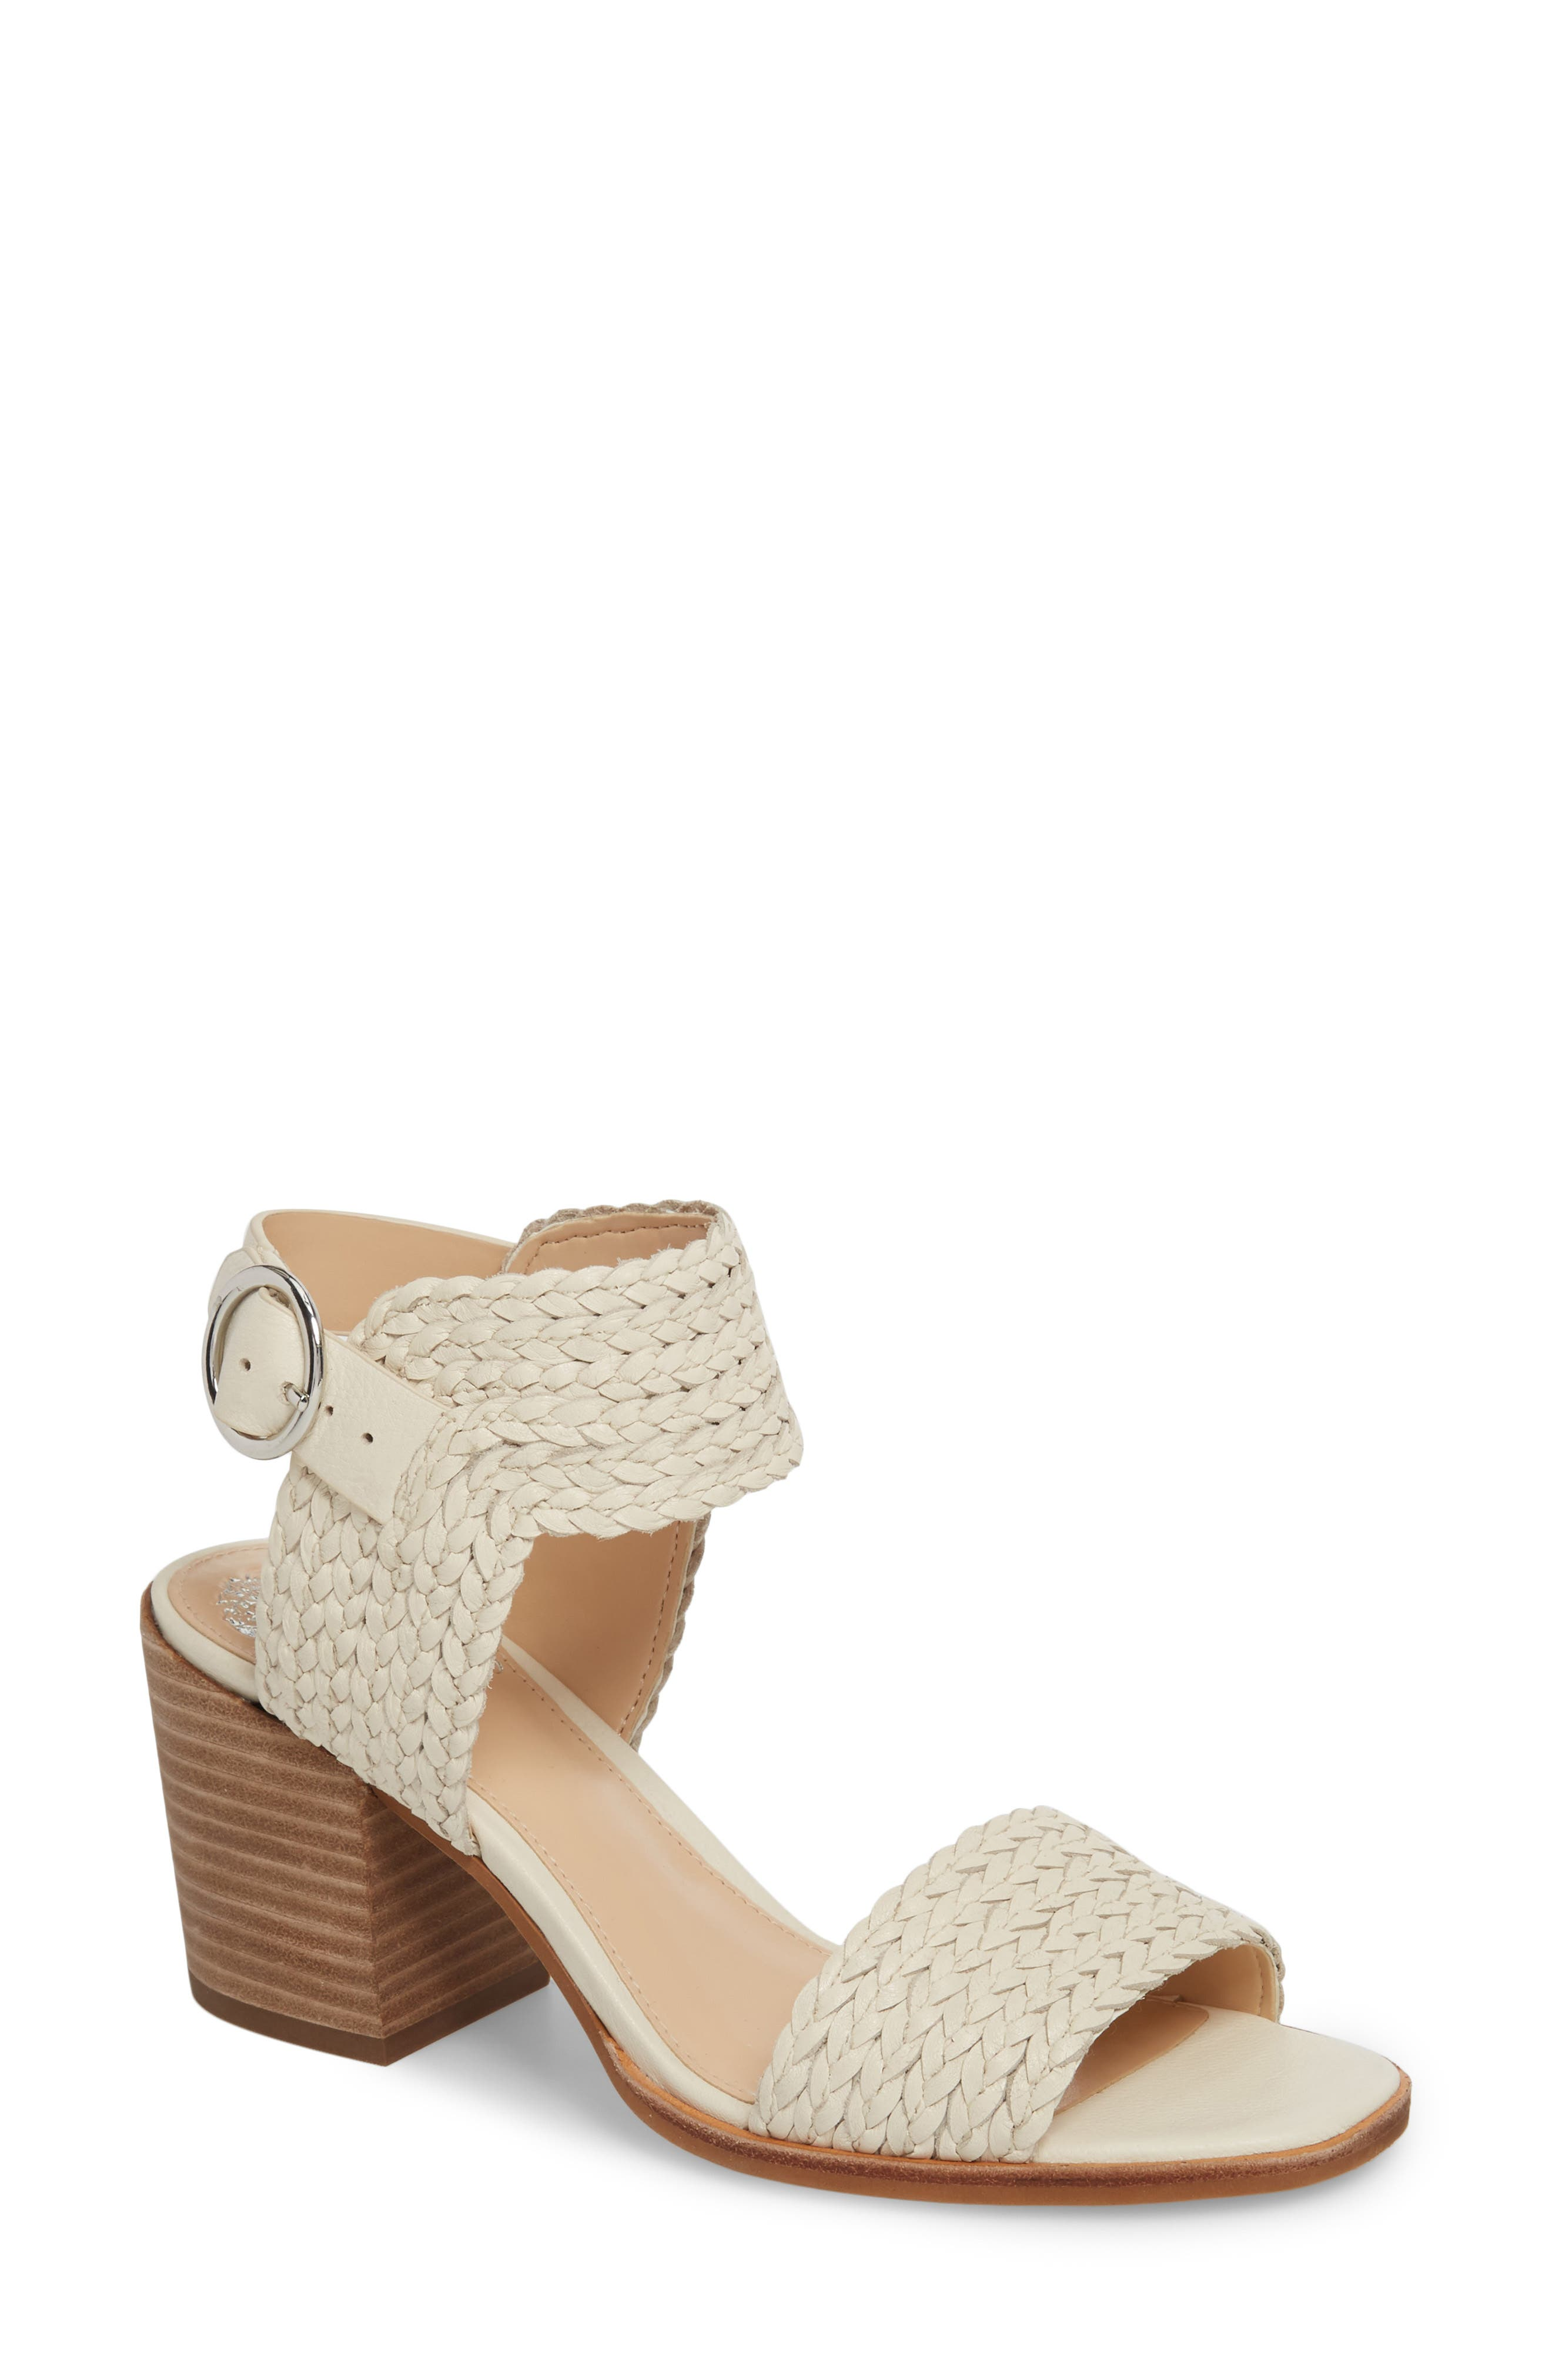 Kolema Sandal,                         Main,                         color, Vanilla Fabric